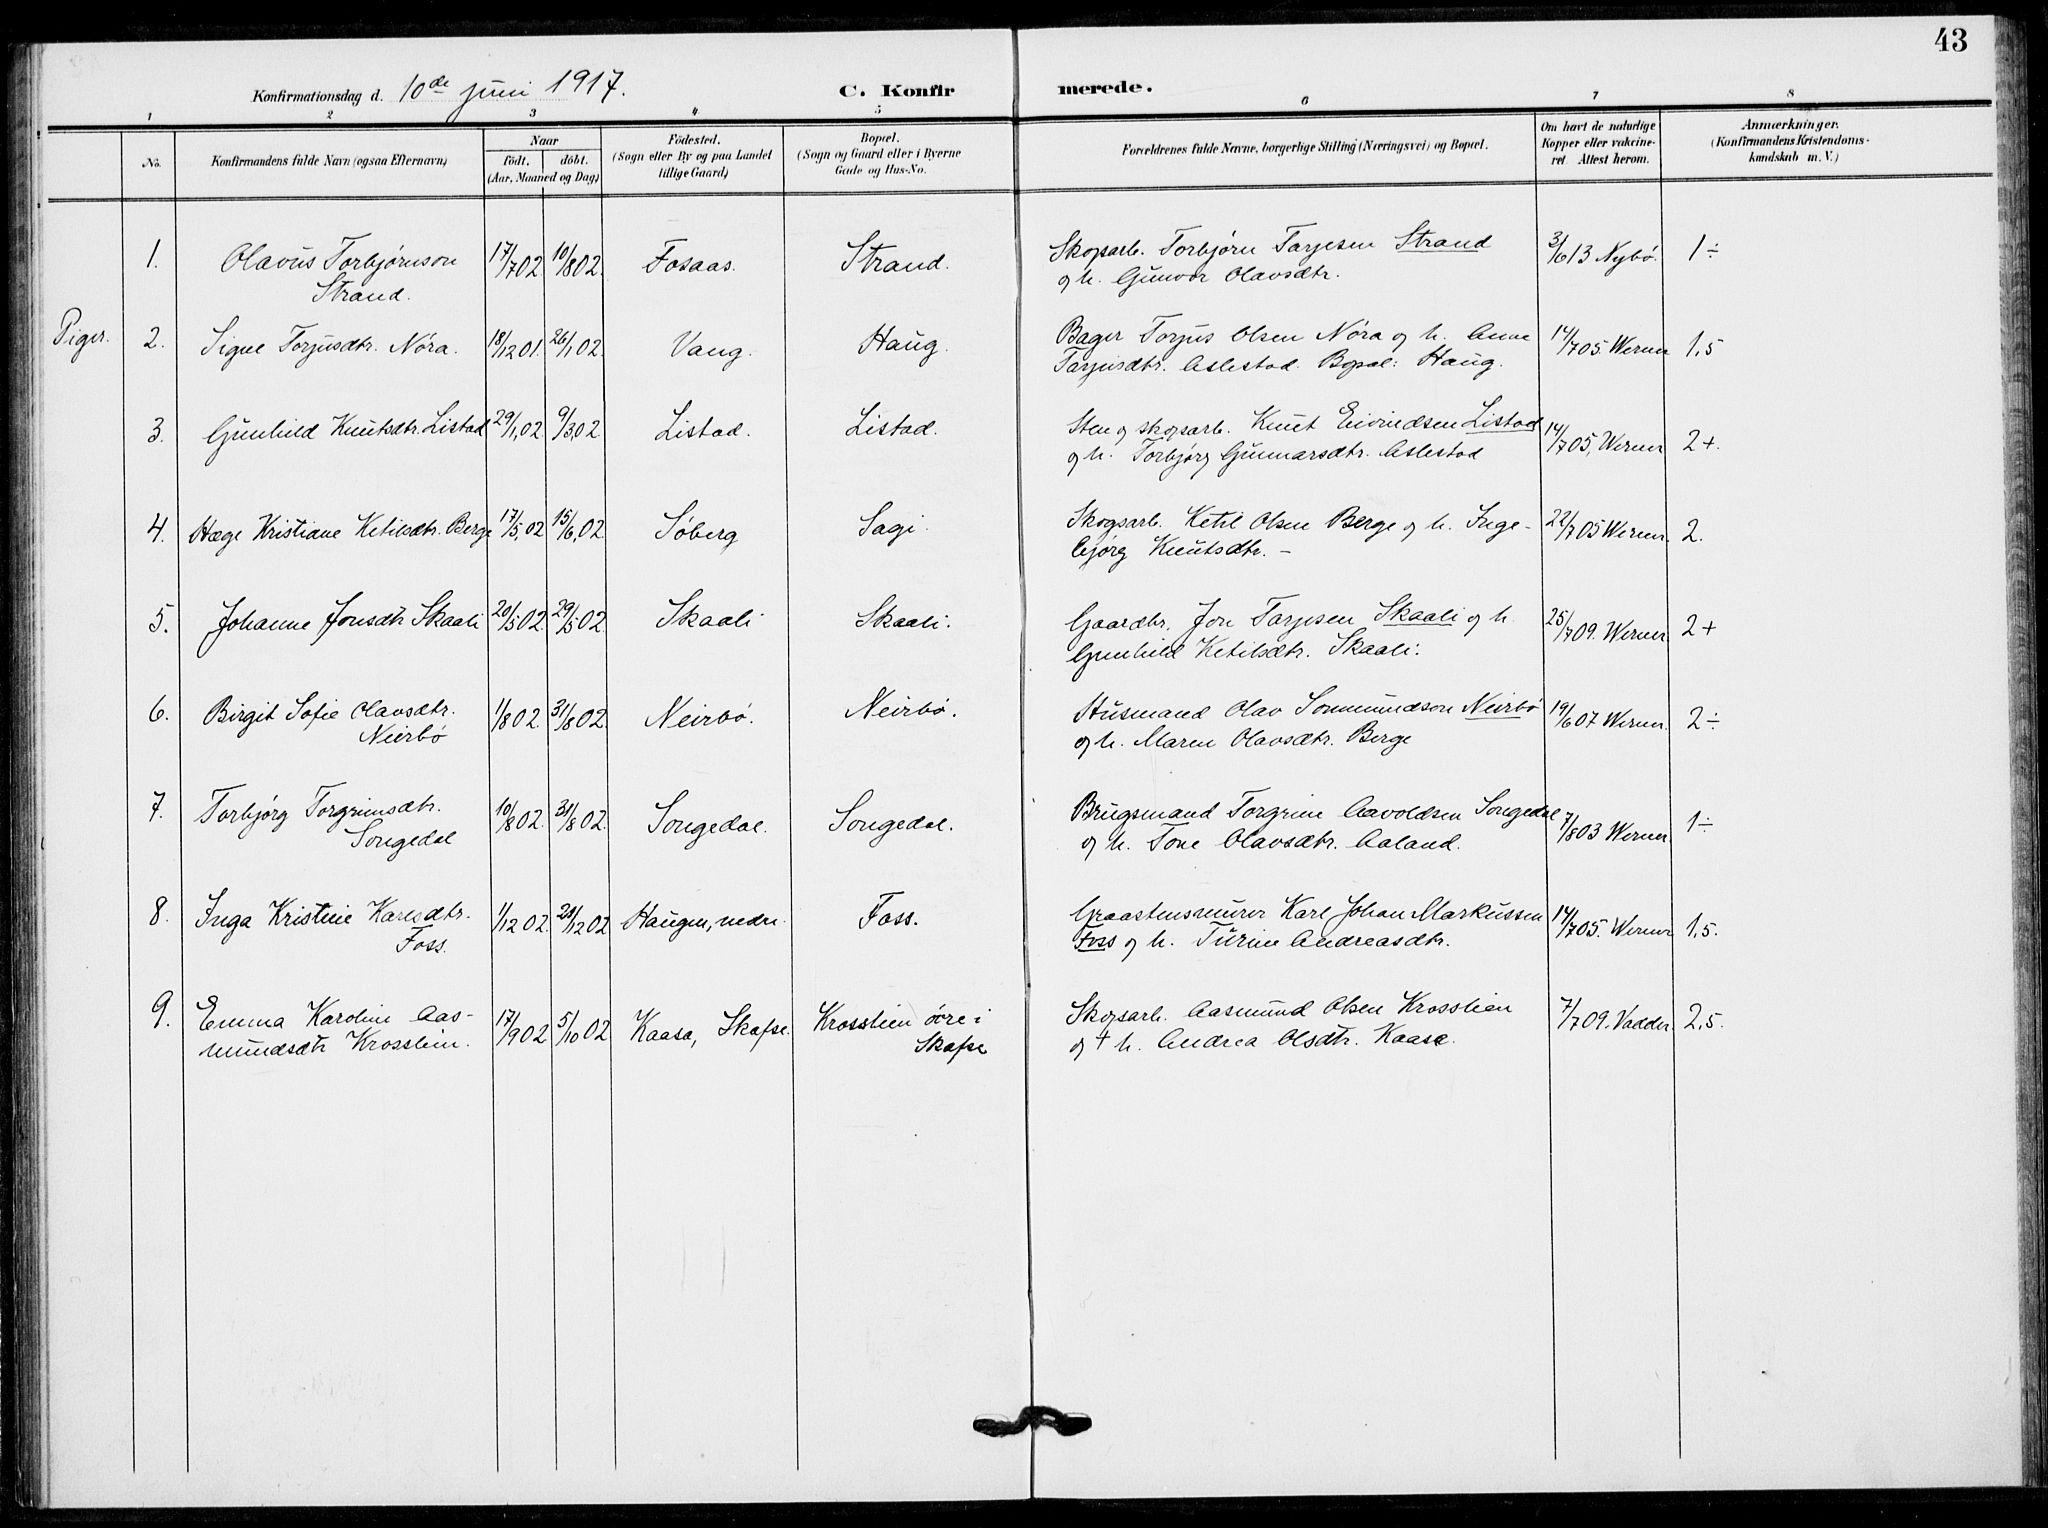 SAKO, Fyresdal kirkebøker, F/Fb/L0004: Ministerialbok nr. II 4, 1903-1920, s. 43